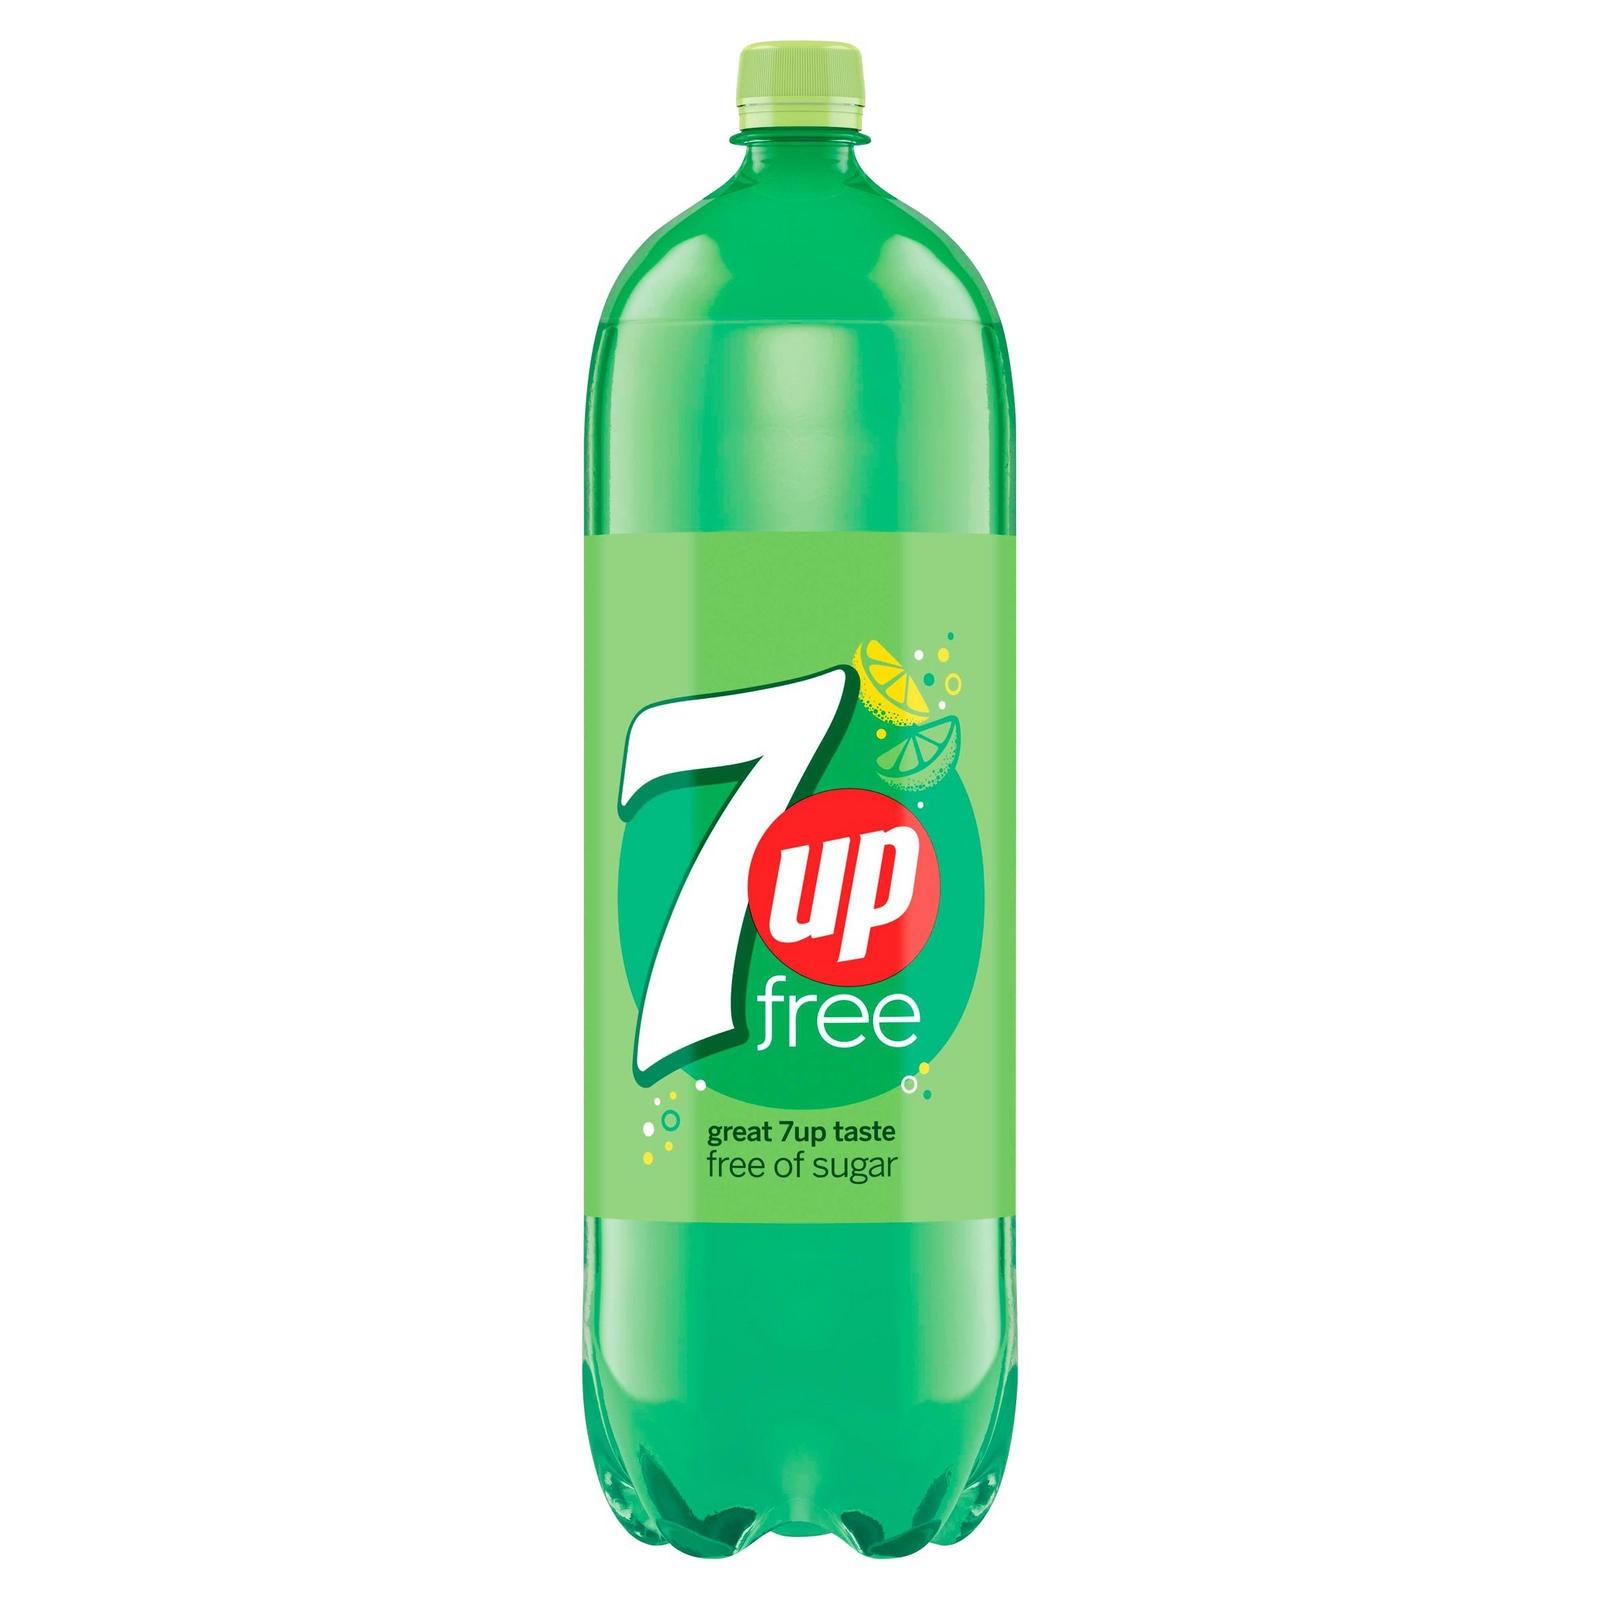 7UP Free Sparkling Lemon & Lime Drink 2L £1 @ Sainsbury's